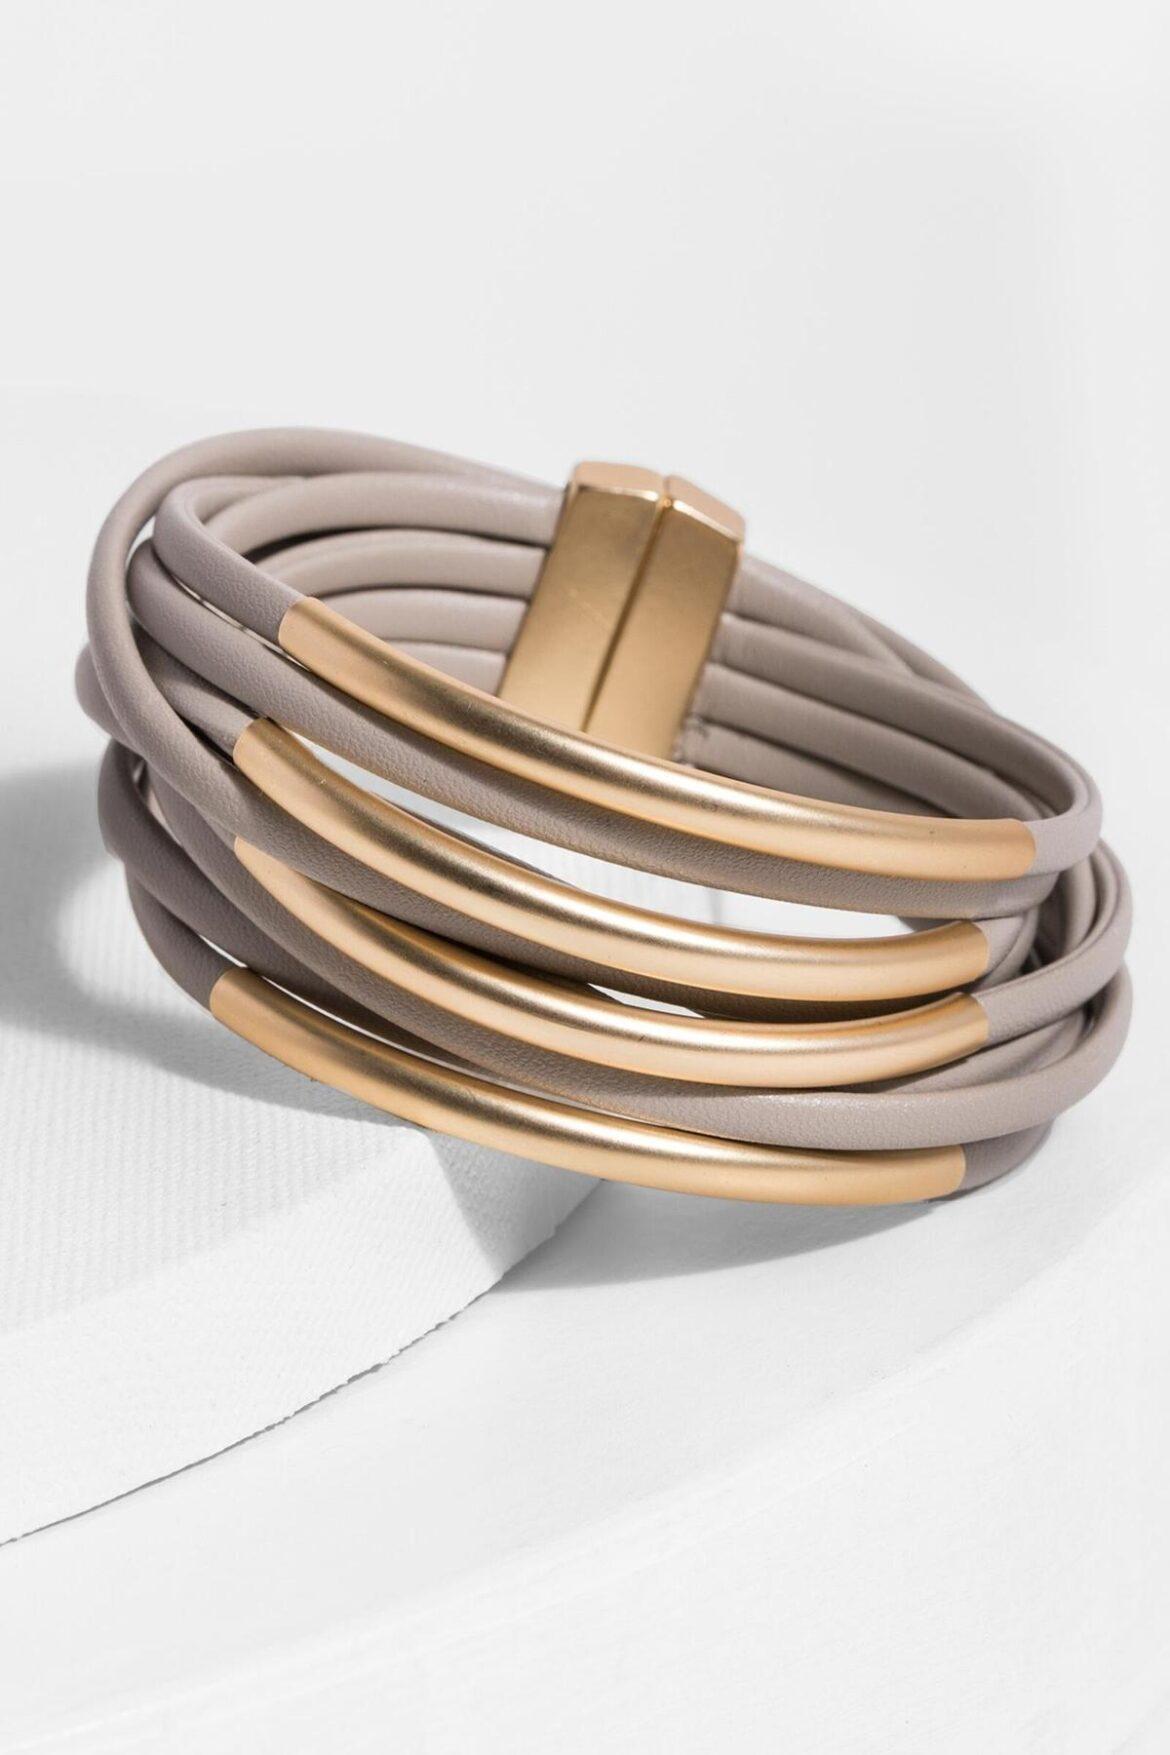 Step by step instructions to Make Leather Bracelets